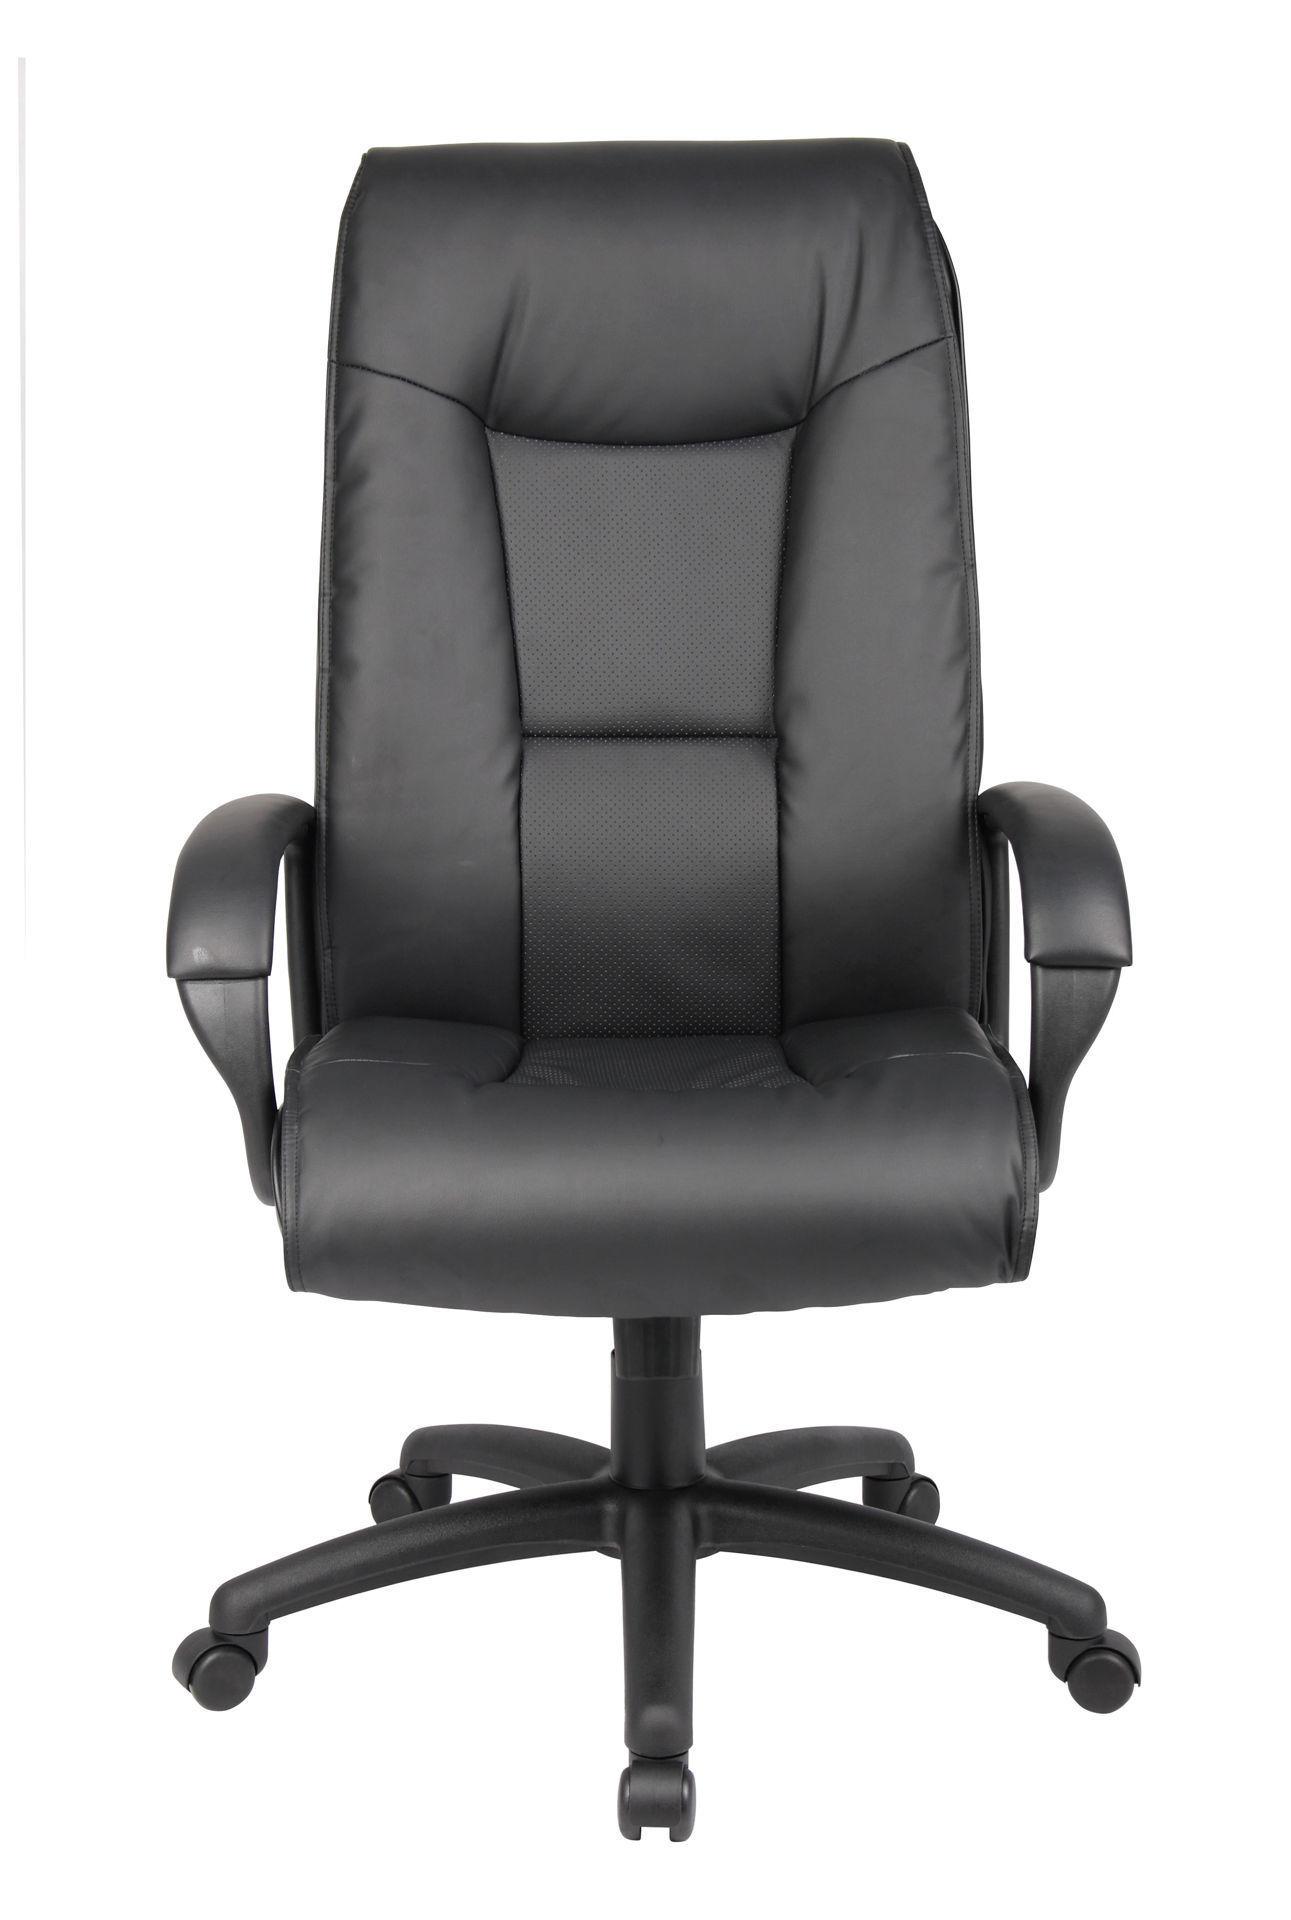 Boss High Back Padded Exec. Chair - Black